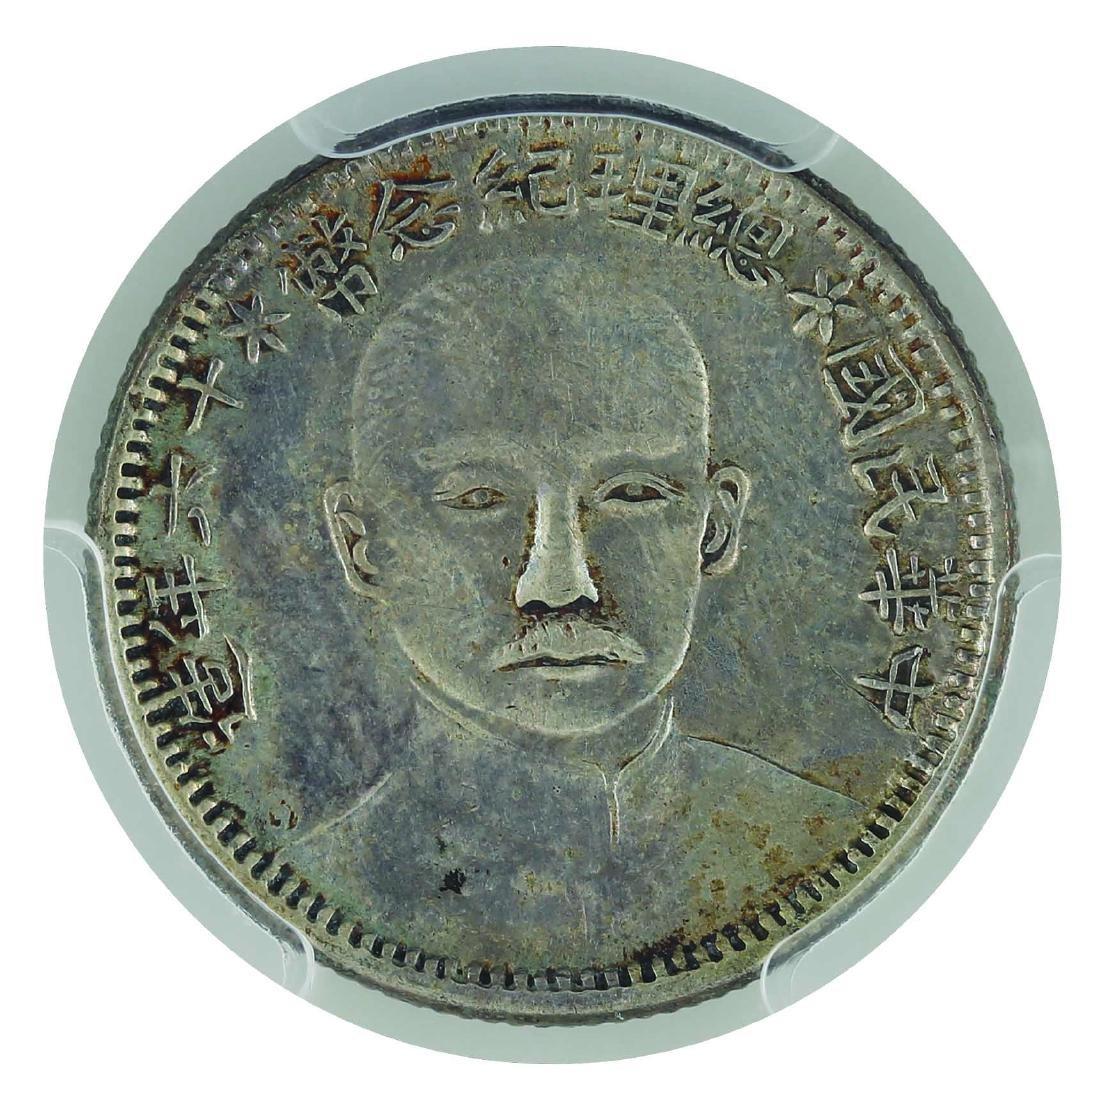 CHINA-Republic 20 Cents, Year 16 (1927).